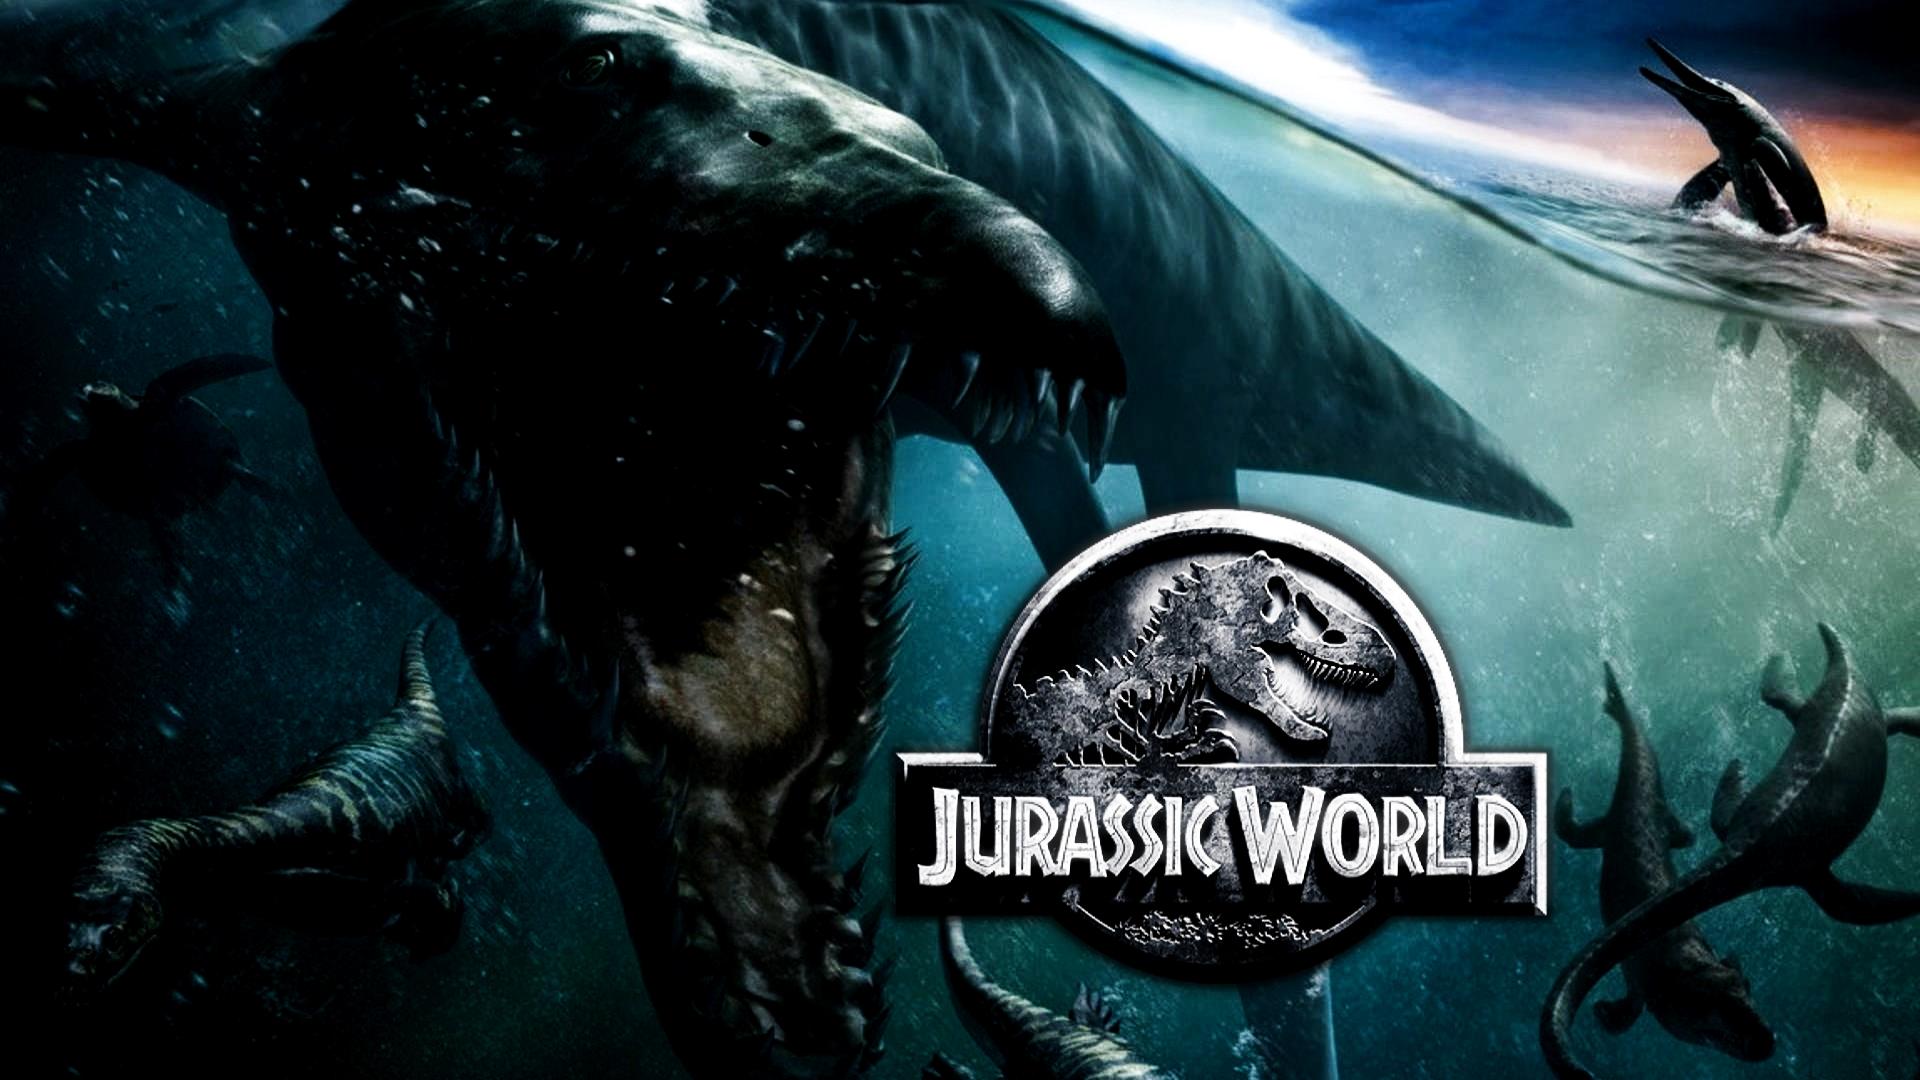 Jurassic World wallpaper 7